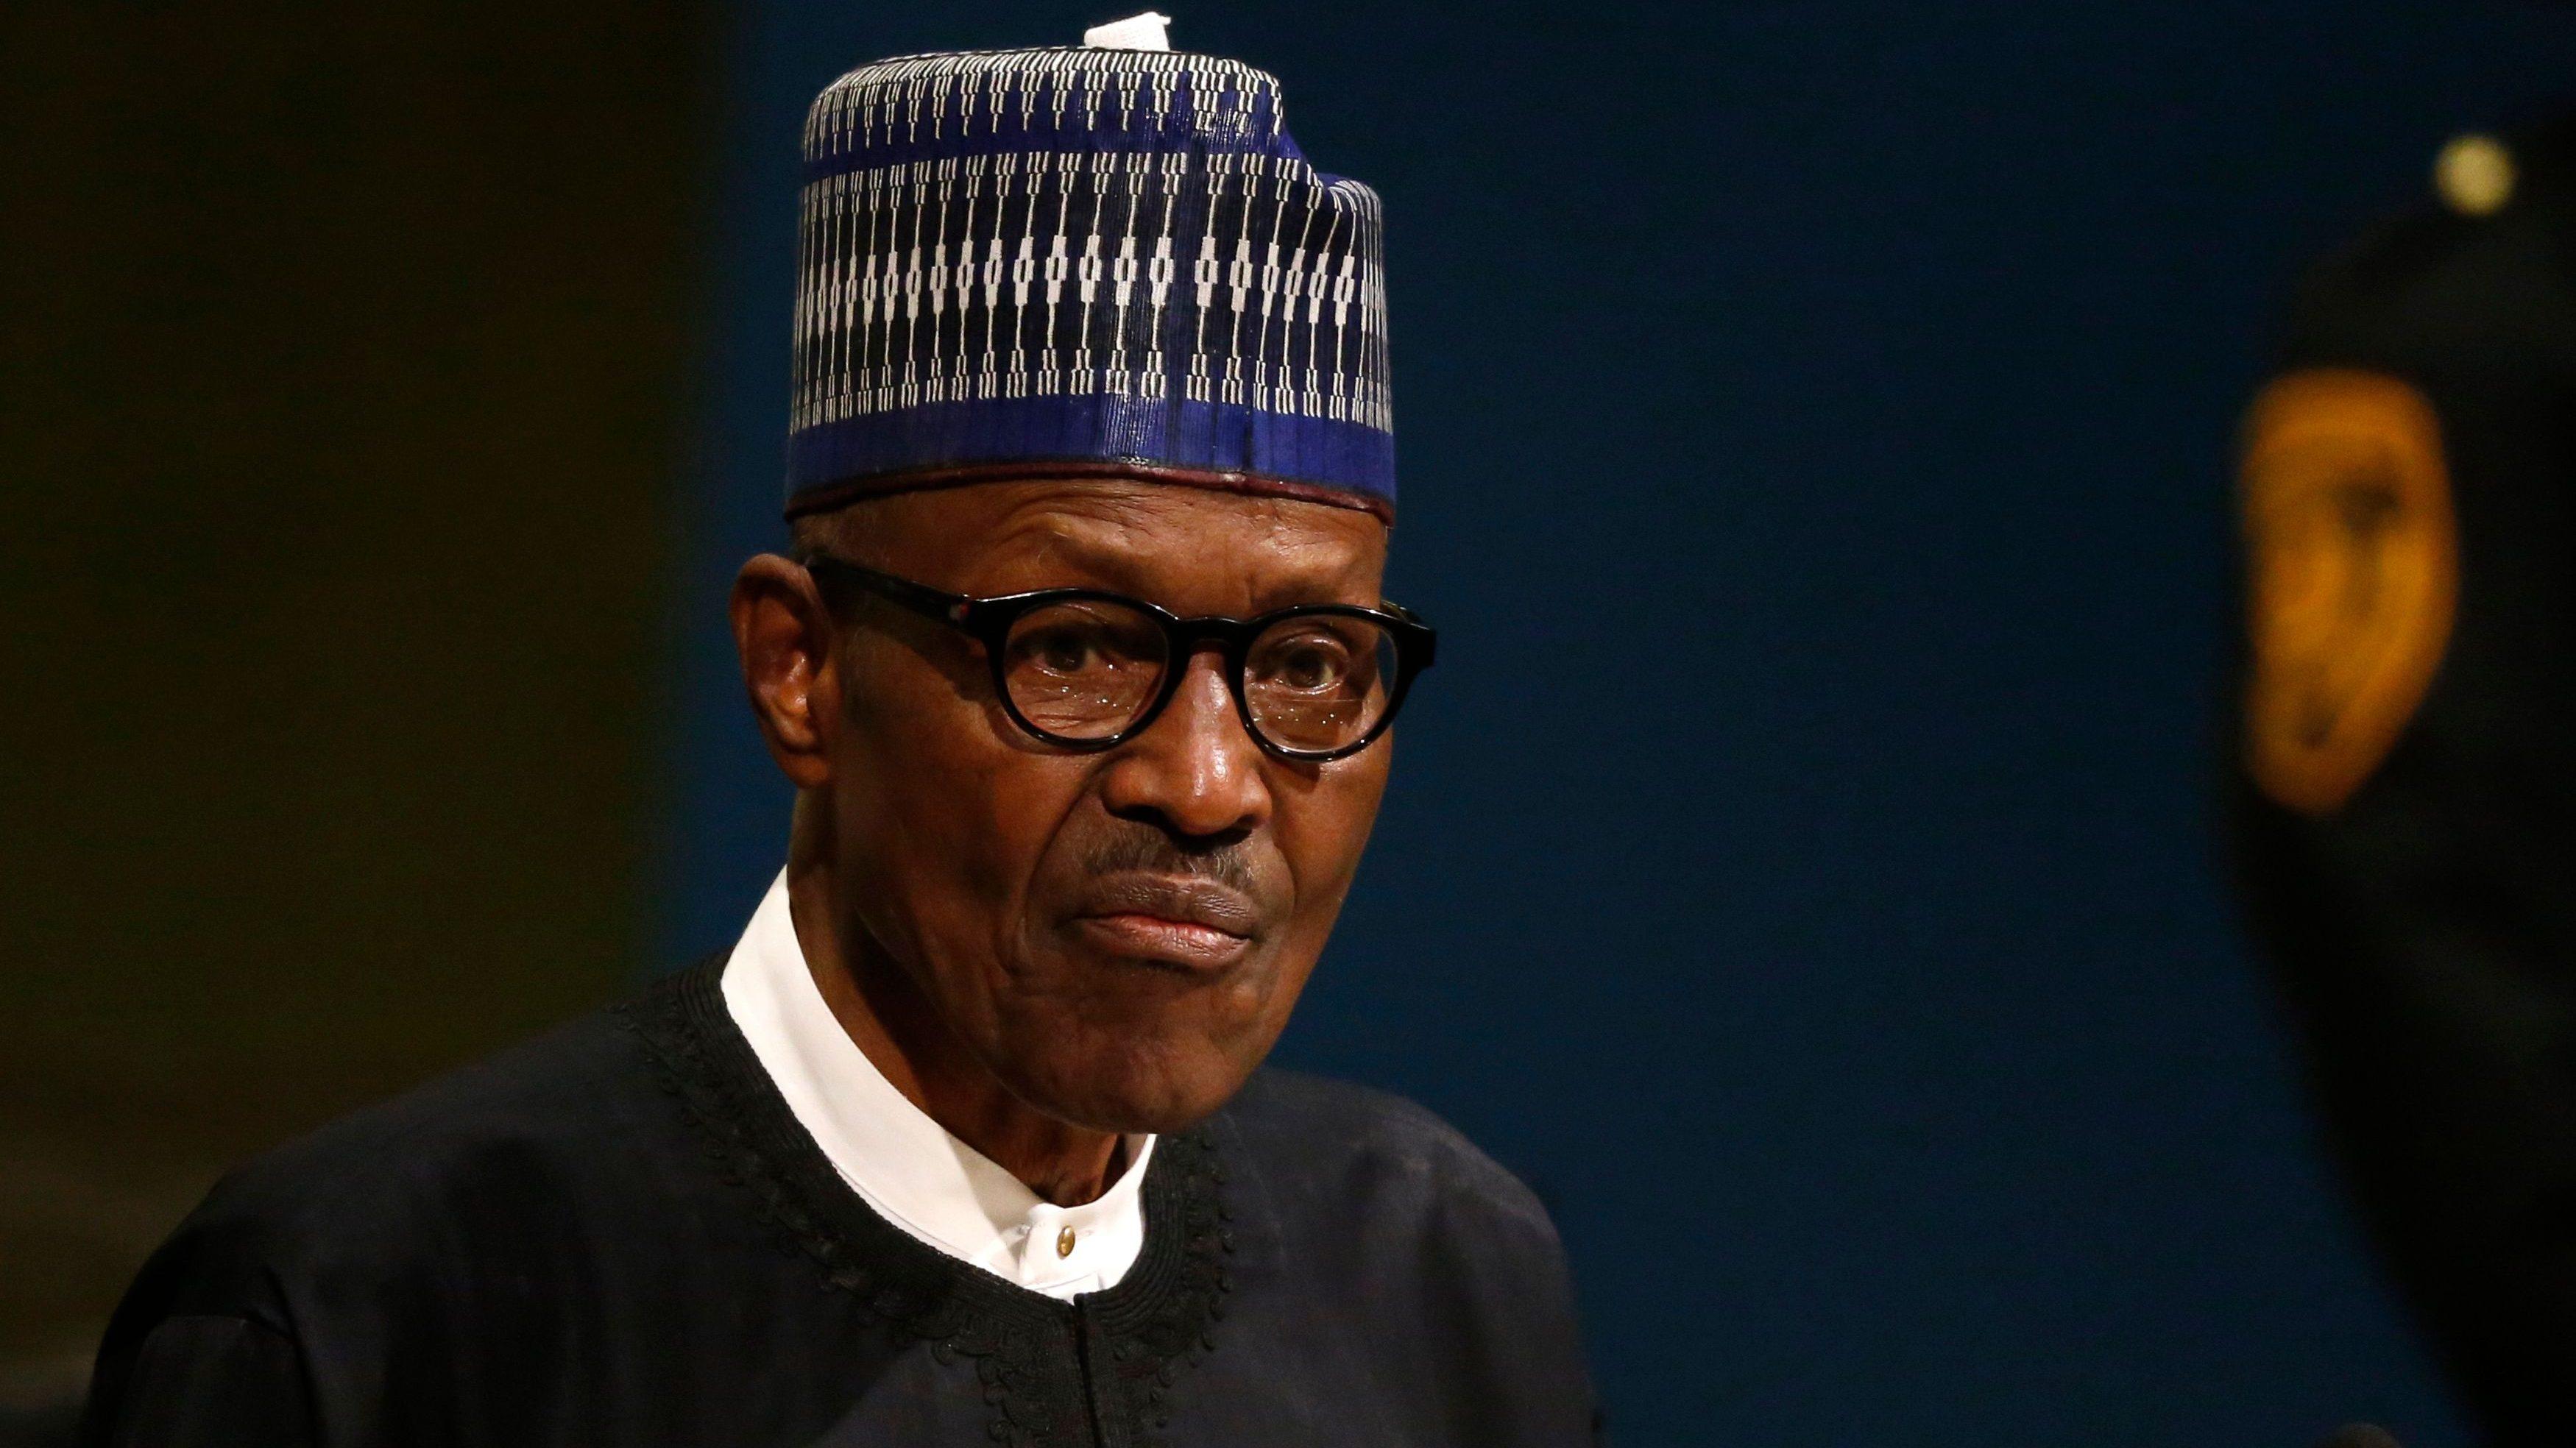 Nigeria's Buhari failed on economy but should win election